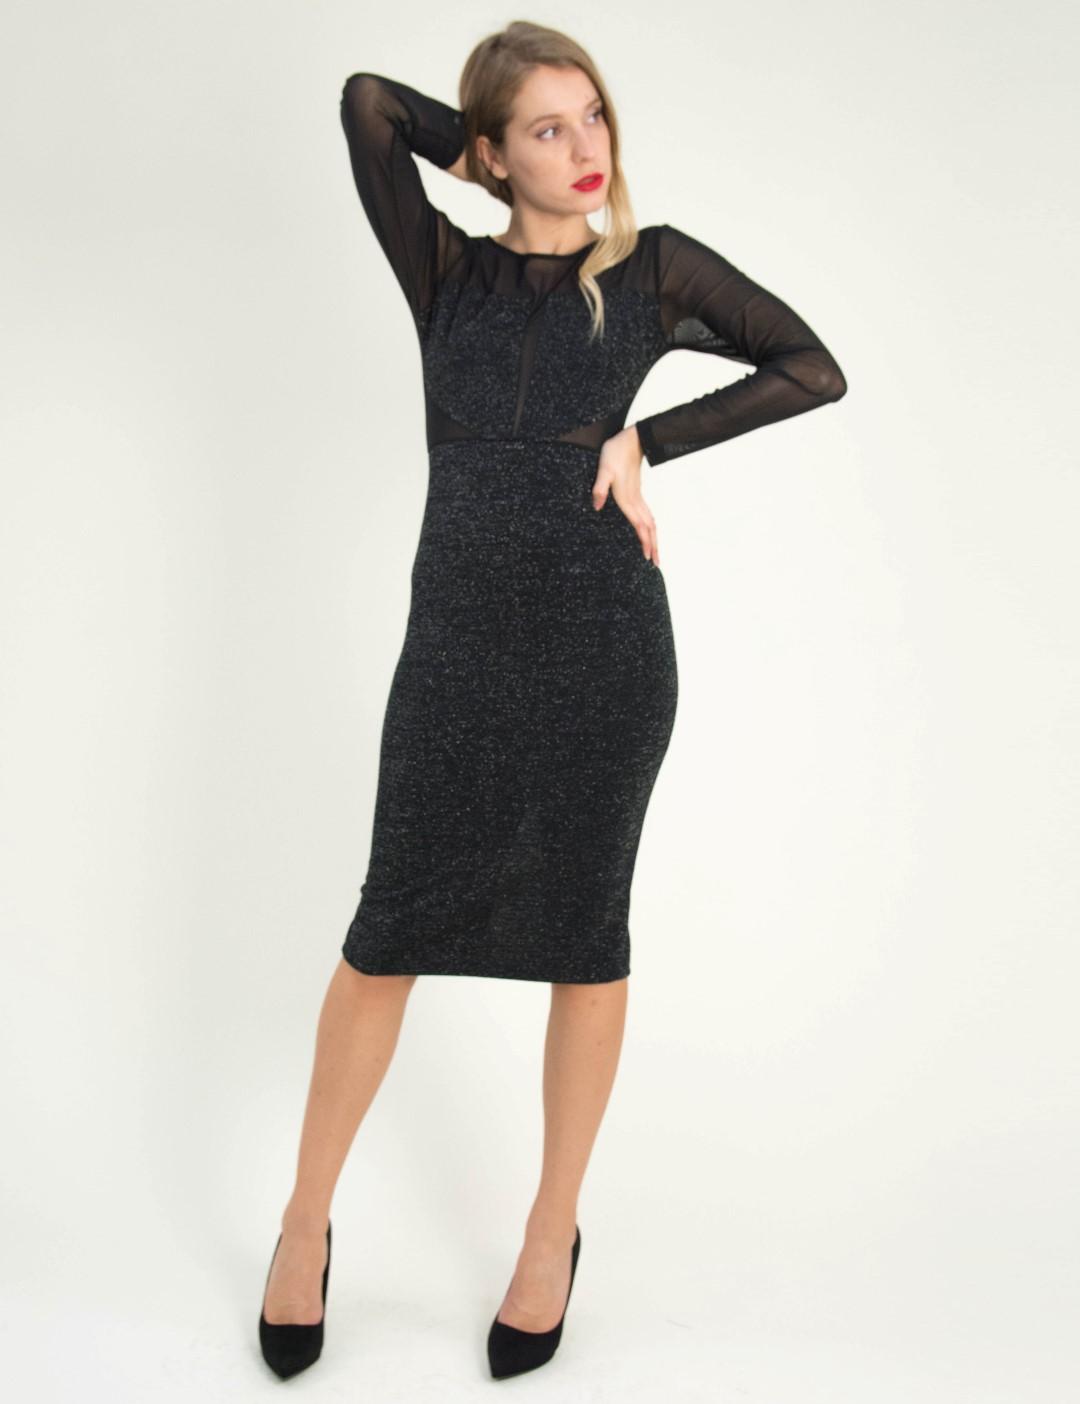 2d7b29fddefe Γυναικείο μαύρο μακρυμάνικο φόρεμα Lurex διαφάνεια 8486195